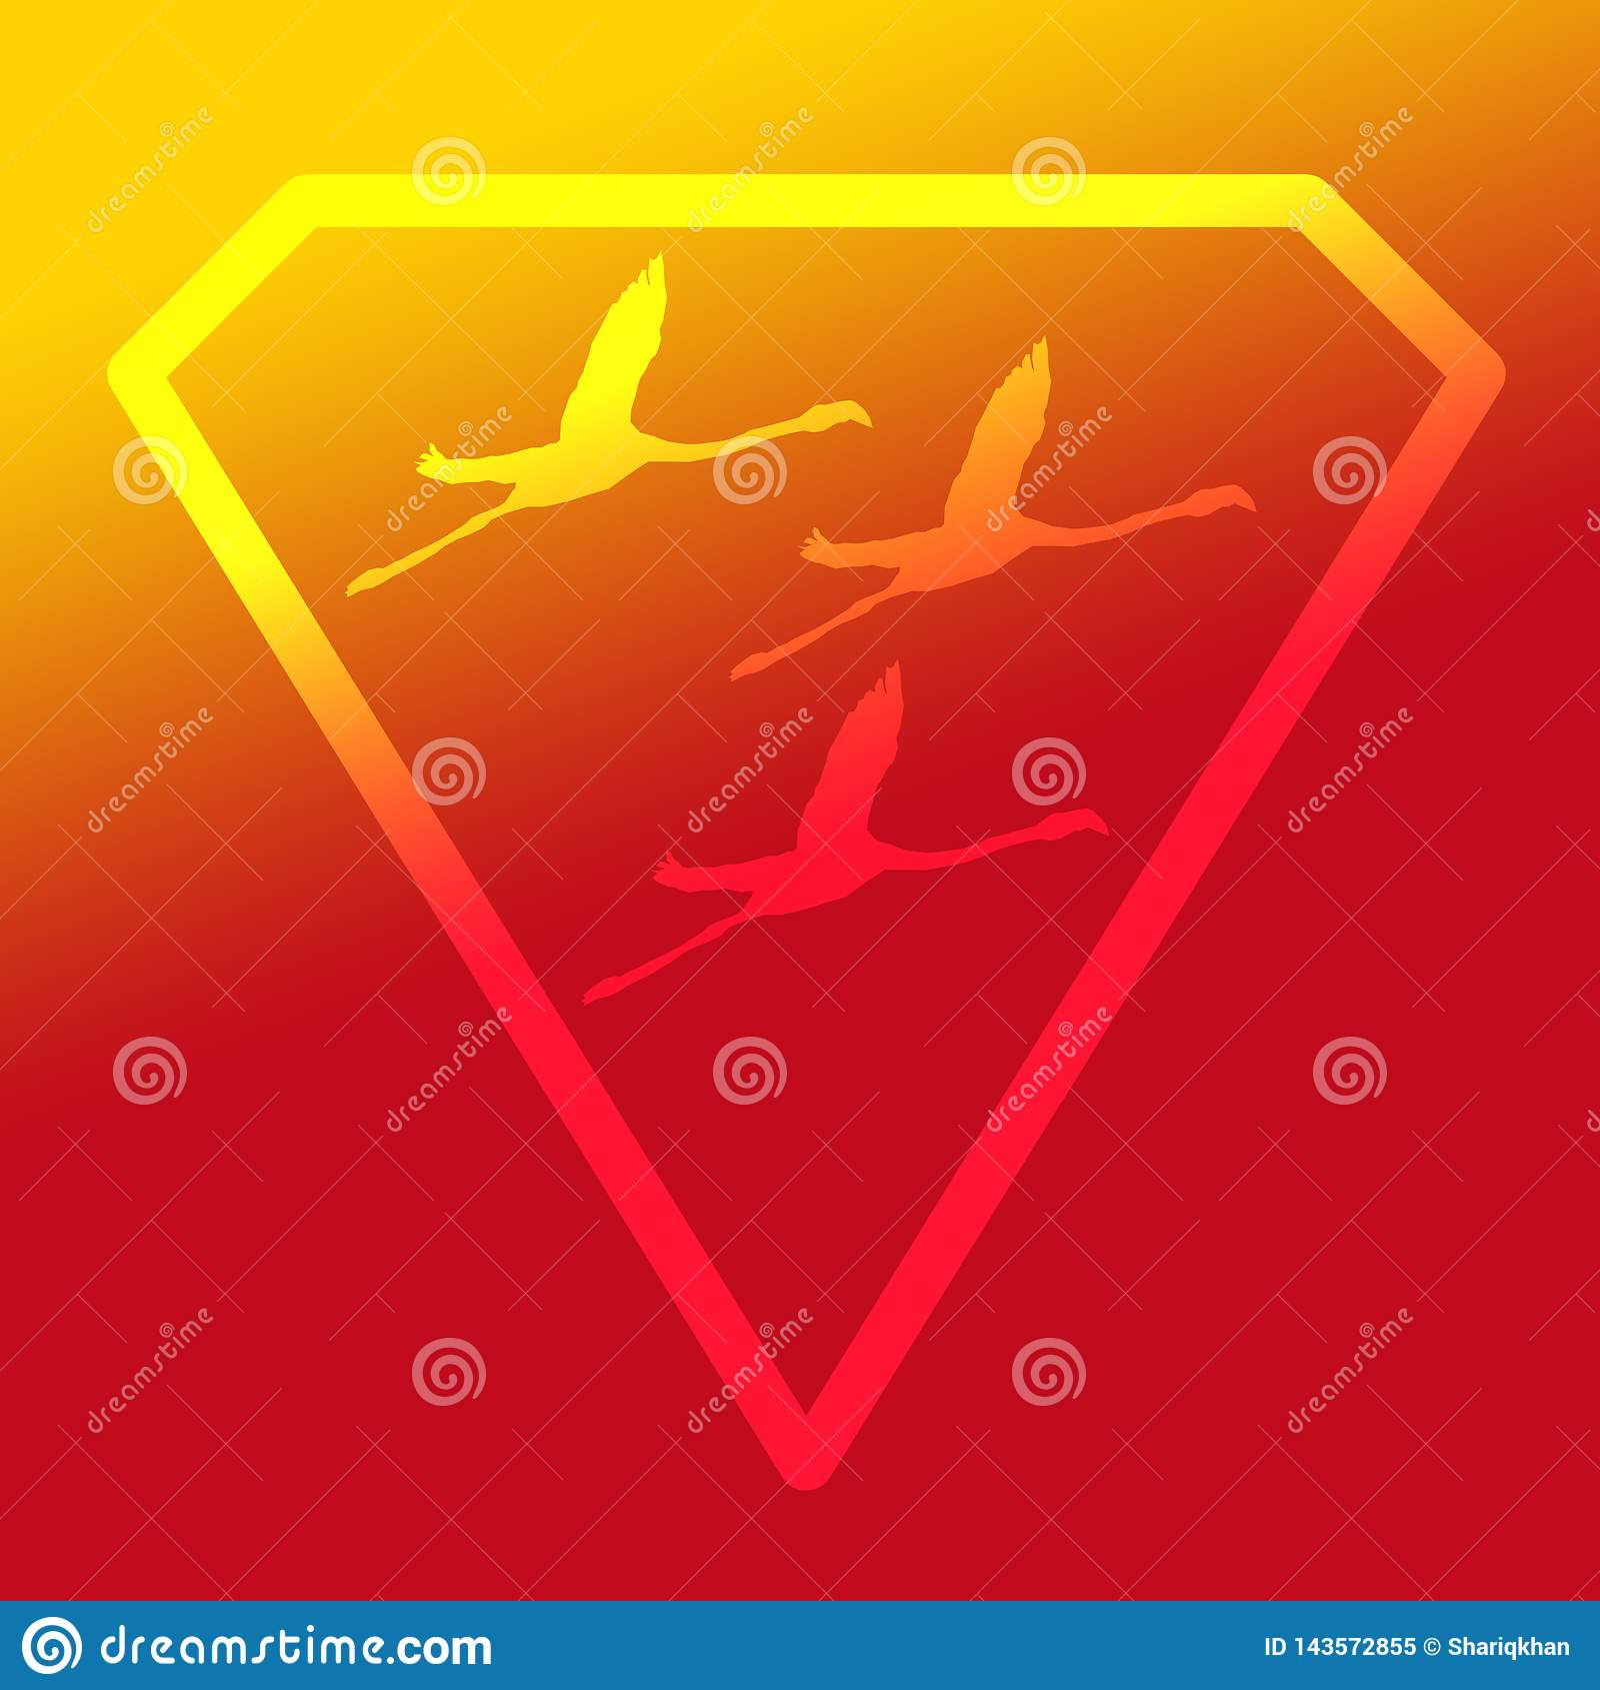 Flamenco de Logo Banner Image Flying Bird en Diamond Shape en fondo amarillo-naranja